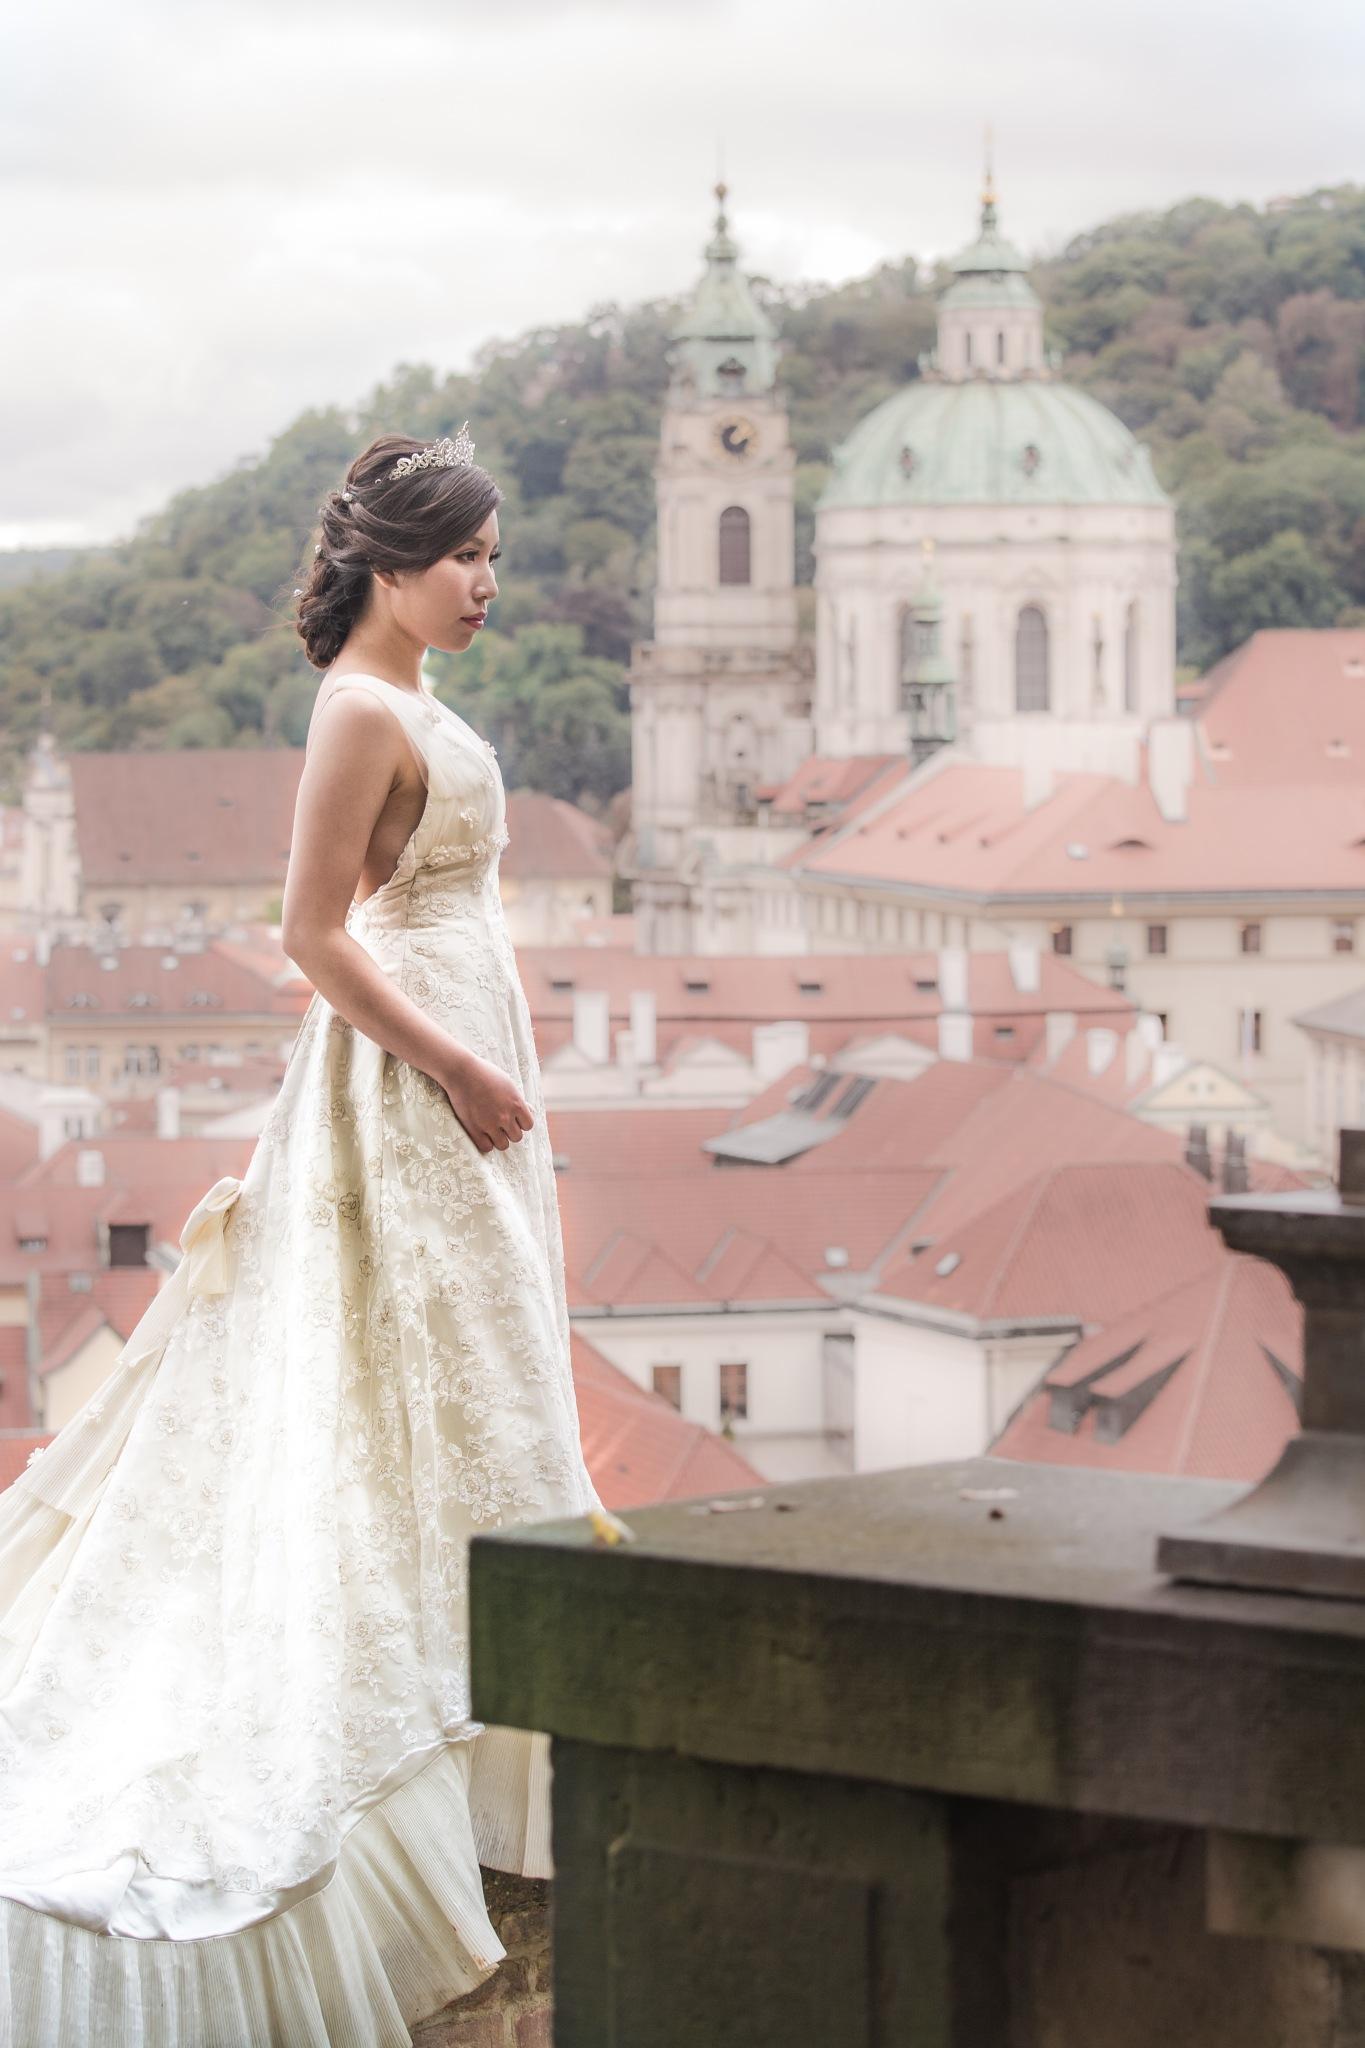 Prague bride by Roman The Great